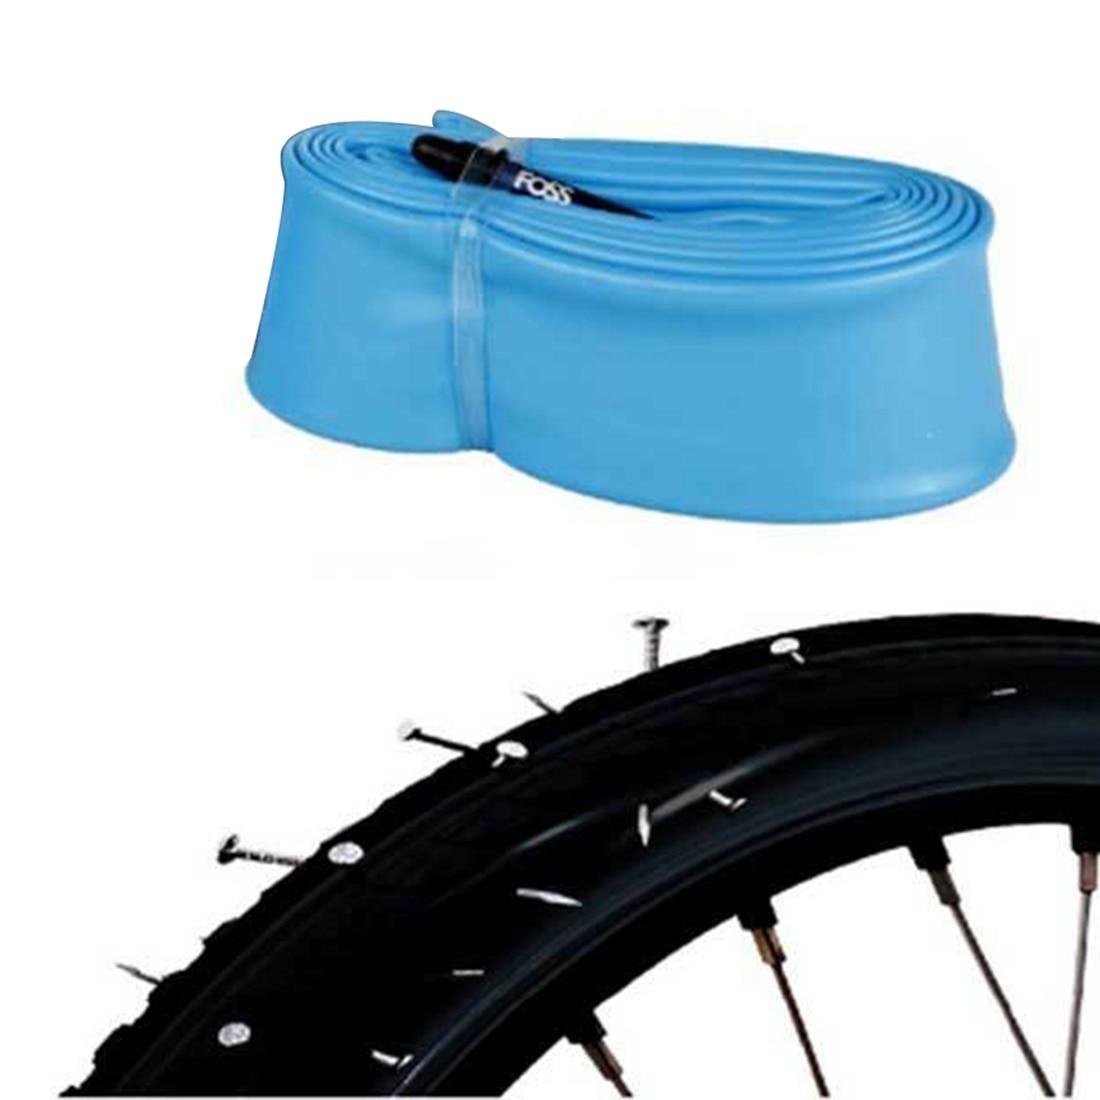 Piezas de tubo Interior FOSS bicicleta carretera Anti-punción caucho no vulcanizado bicicleta tubo Interior bicicleta neumático Interior 26/27.5/29 pulgadas MTB